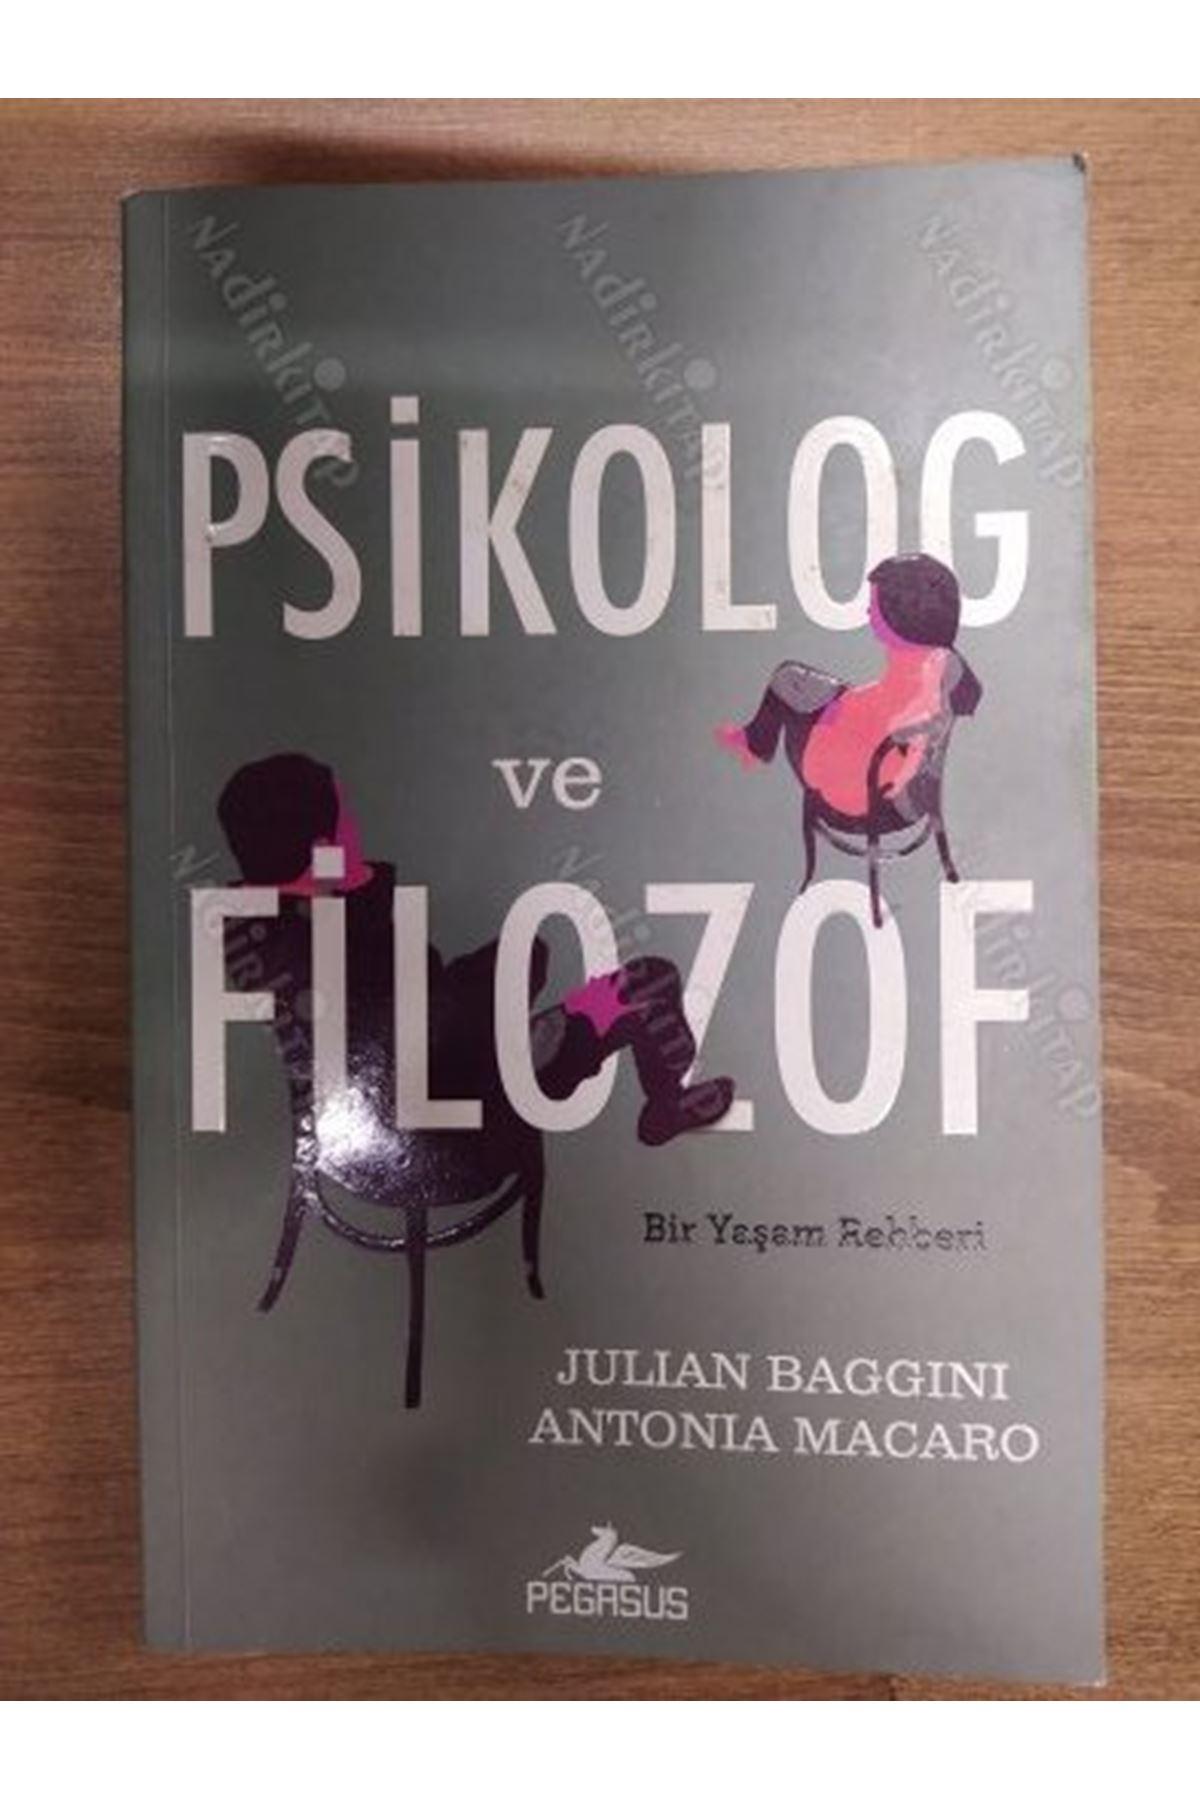 JULLIIAN BAGGINI ANTONIA MACARO - PSİKOLOG VE FİLOZOF